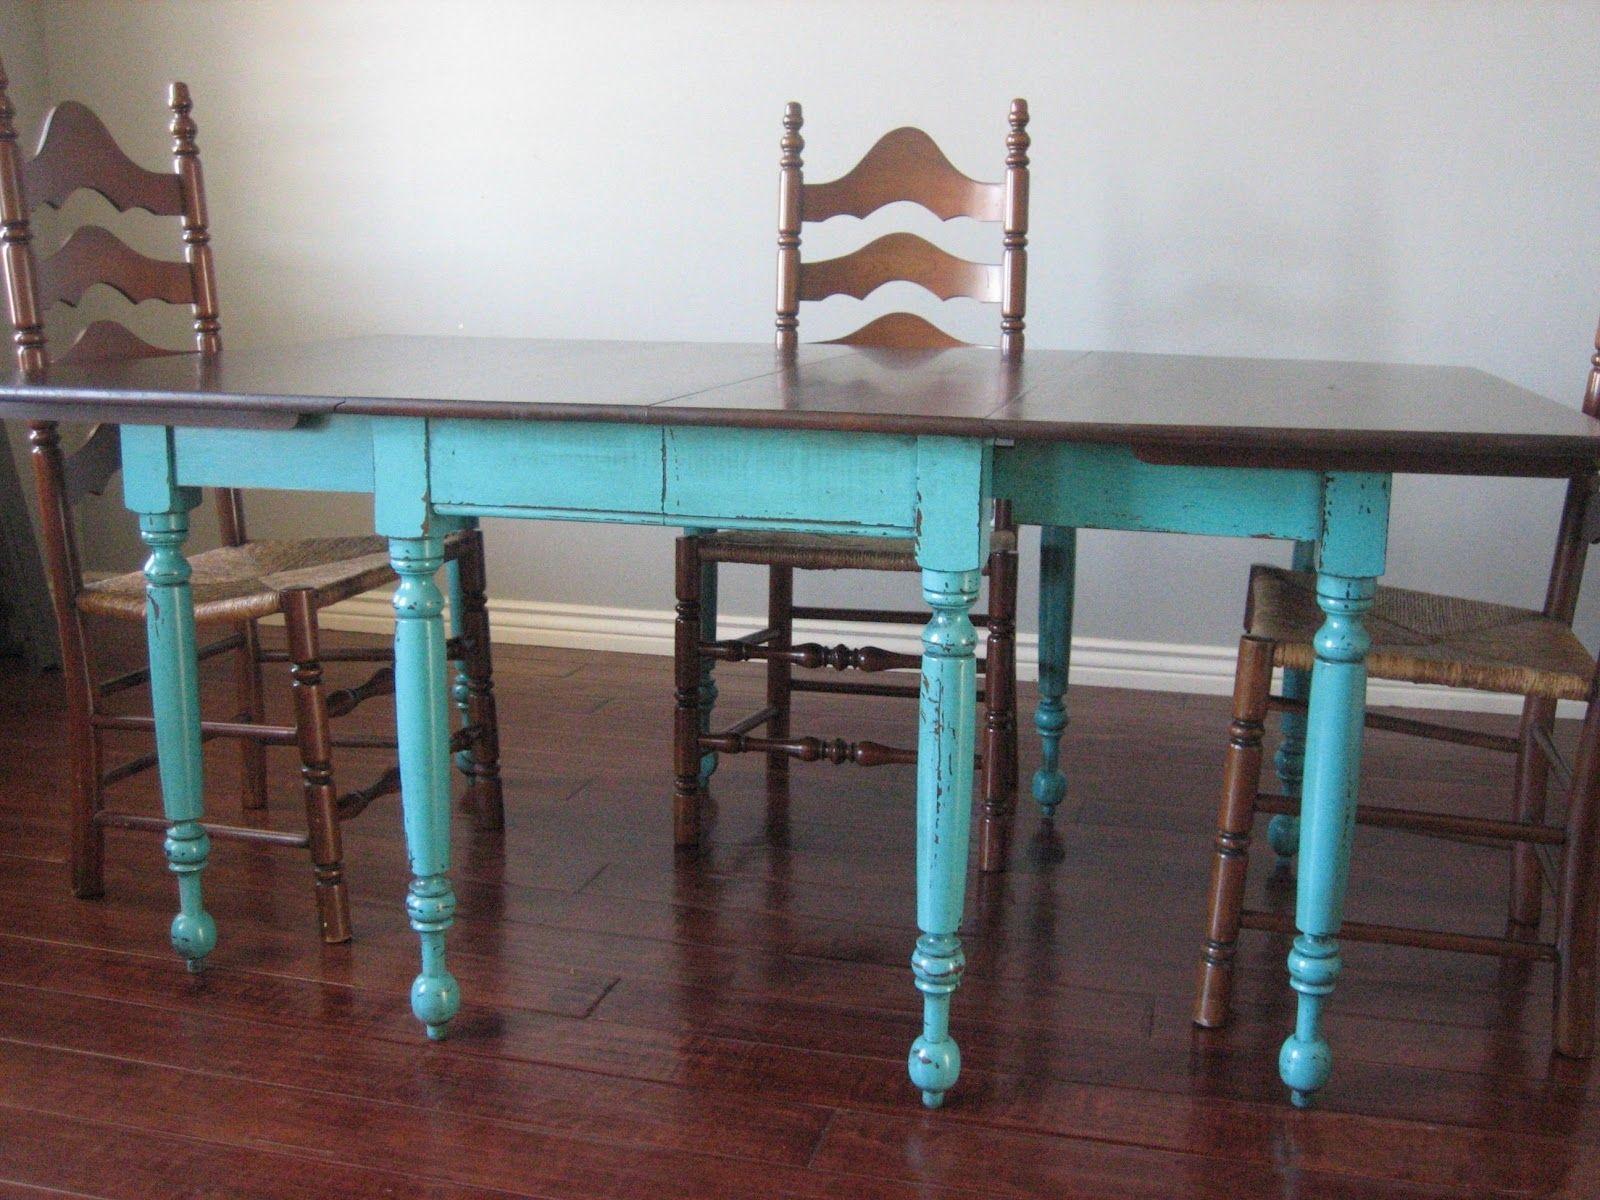 Teal Dining Table Chairs | http://enricbataller.net | Pinterest ...